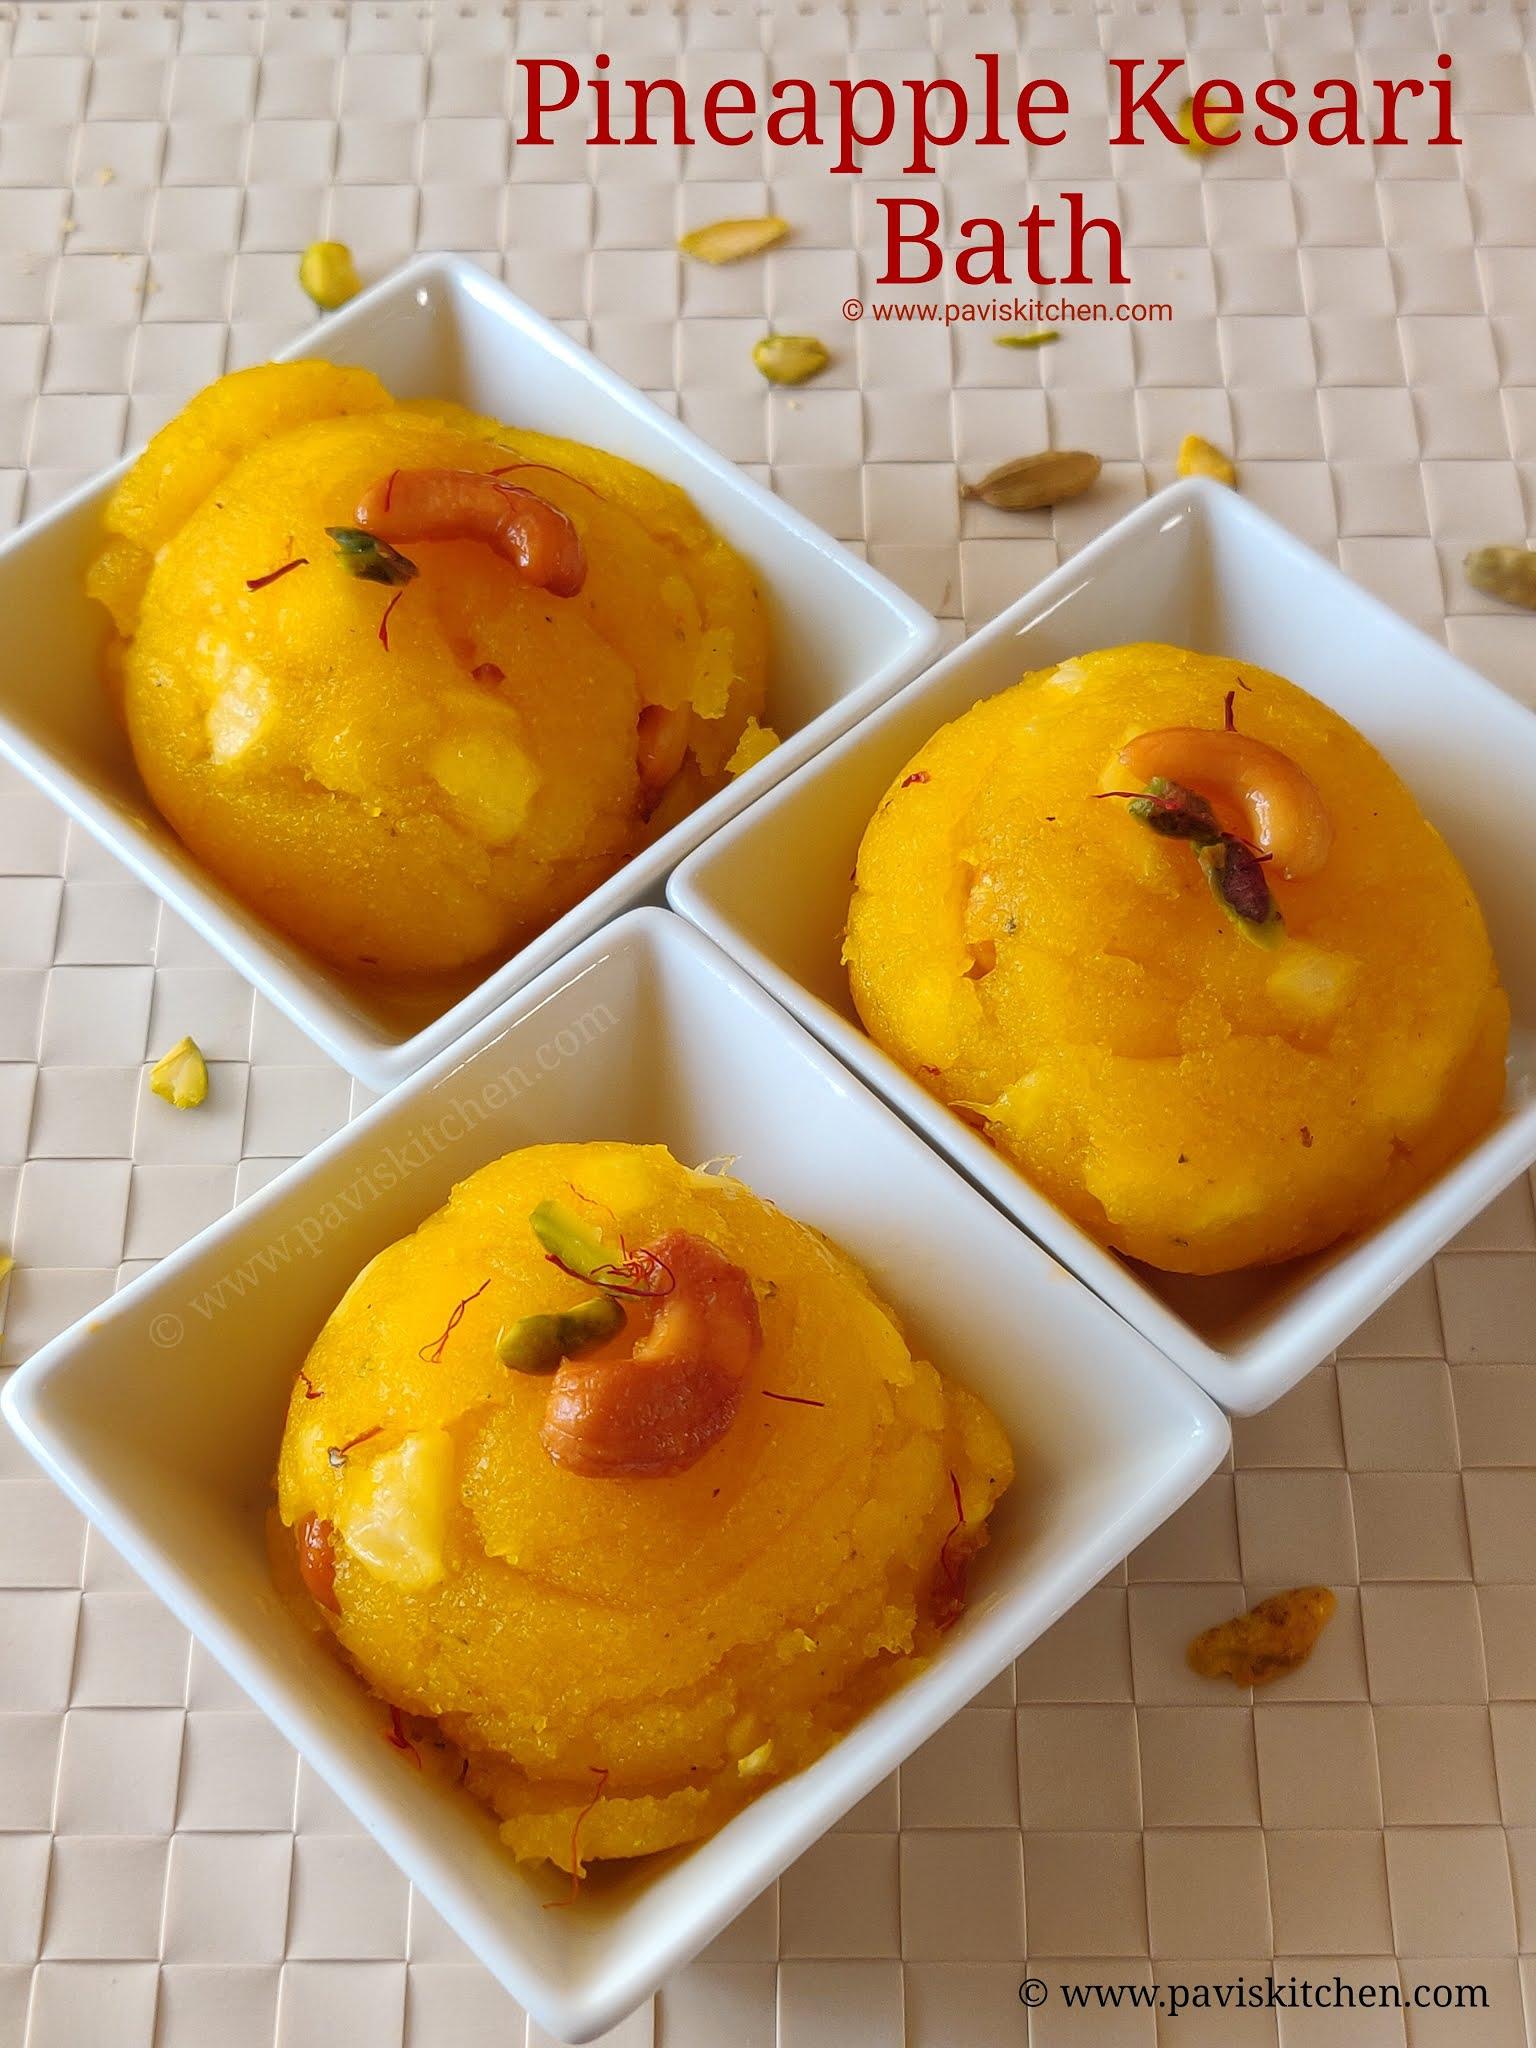 Pineapple kesari recipe | pineapple rava kesari | pineapple kesari bath